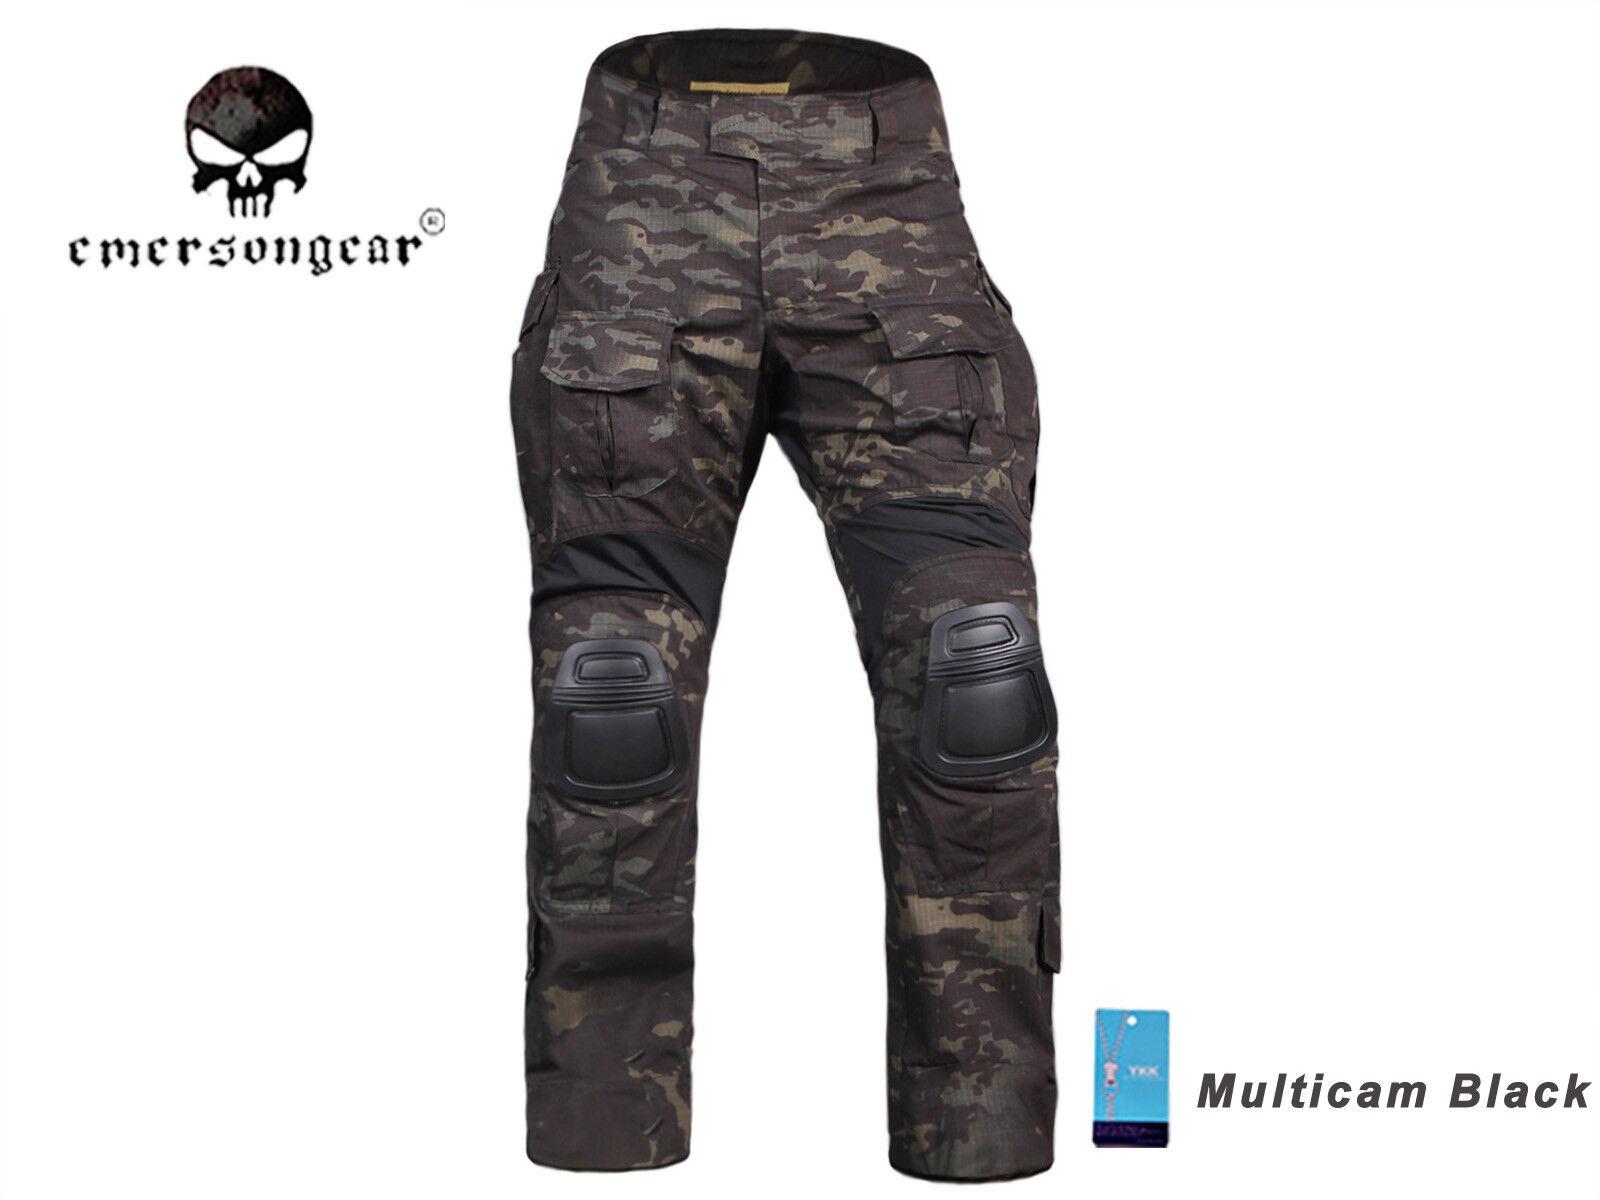 Emerson Combat Gen3 Pantalones Con Rodillera Airsoft Caza Pantalones Tácticos MCBK